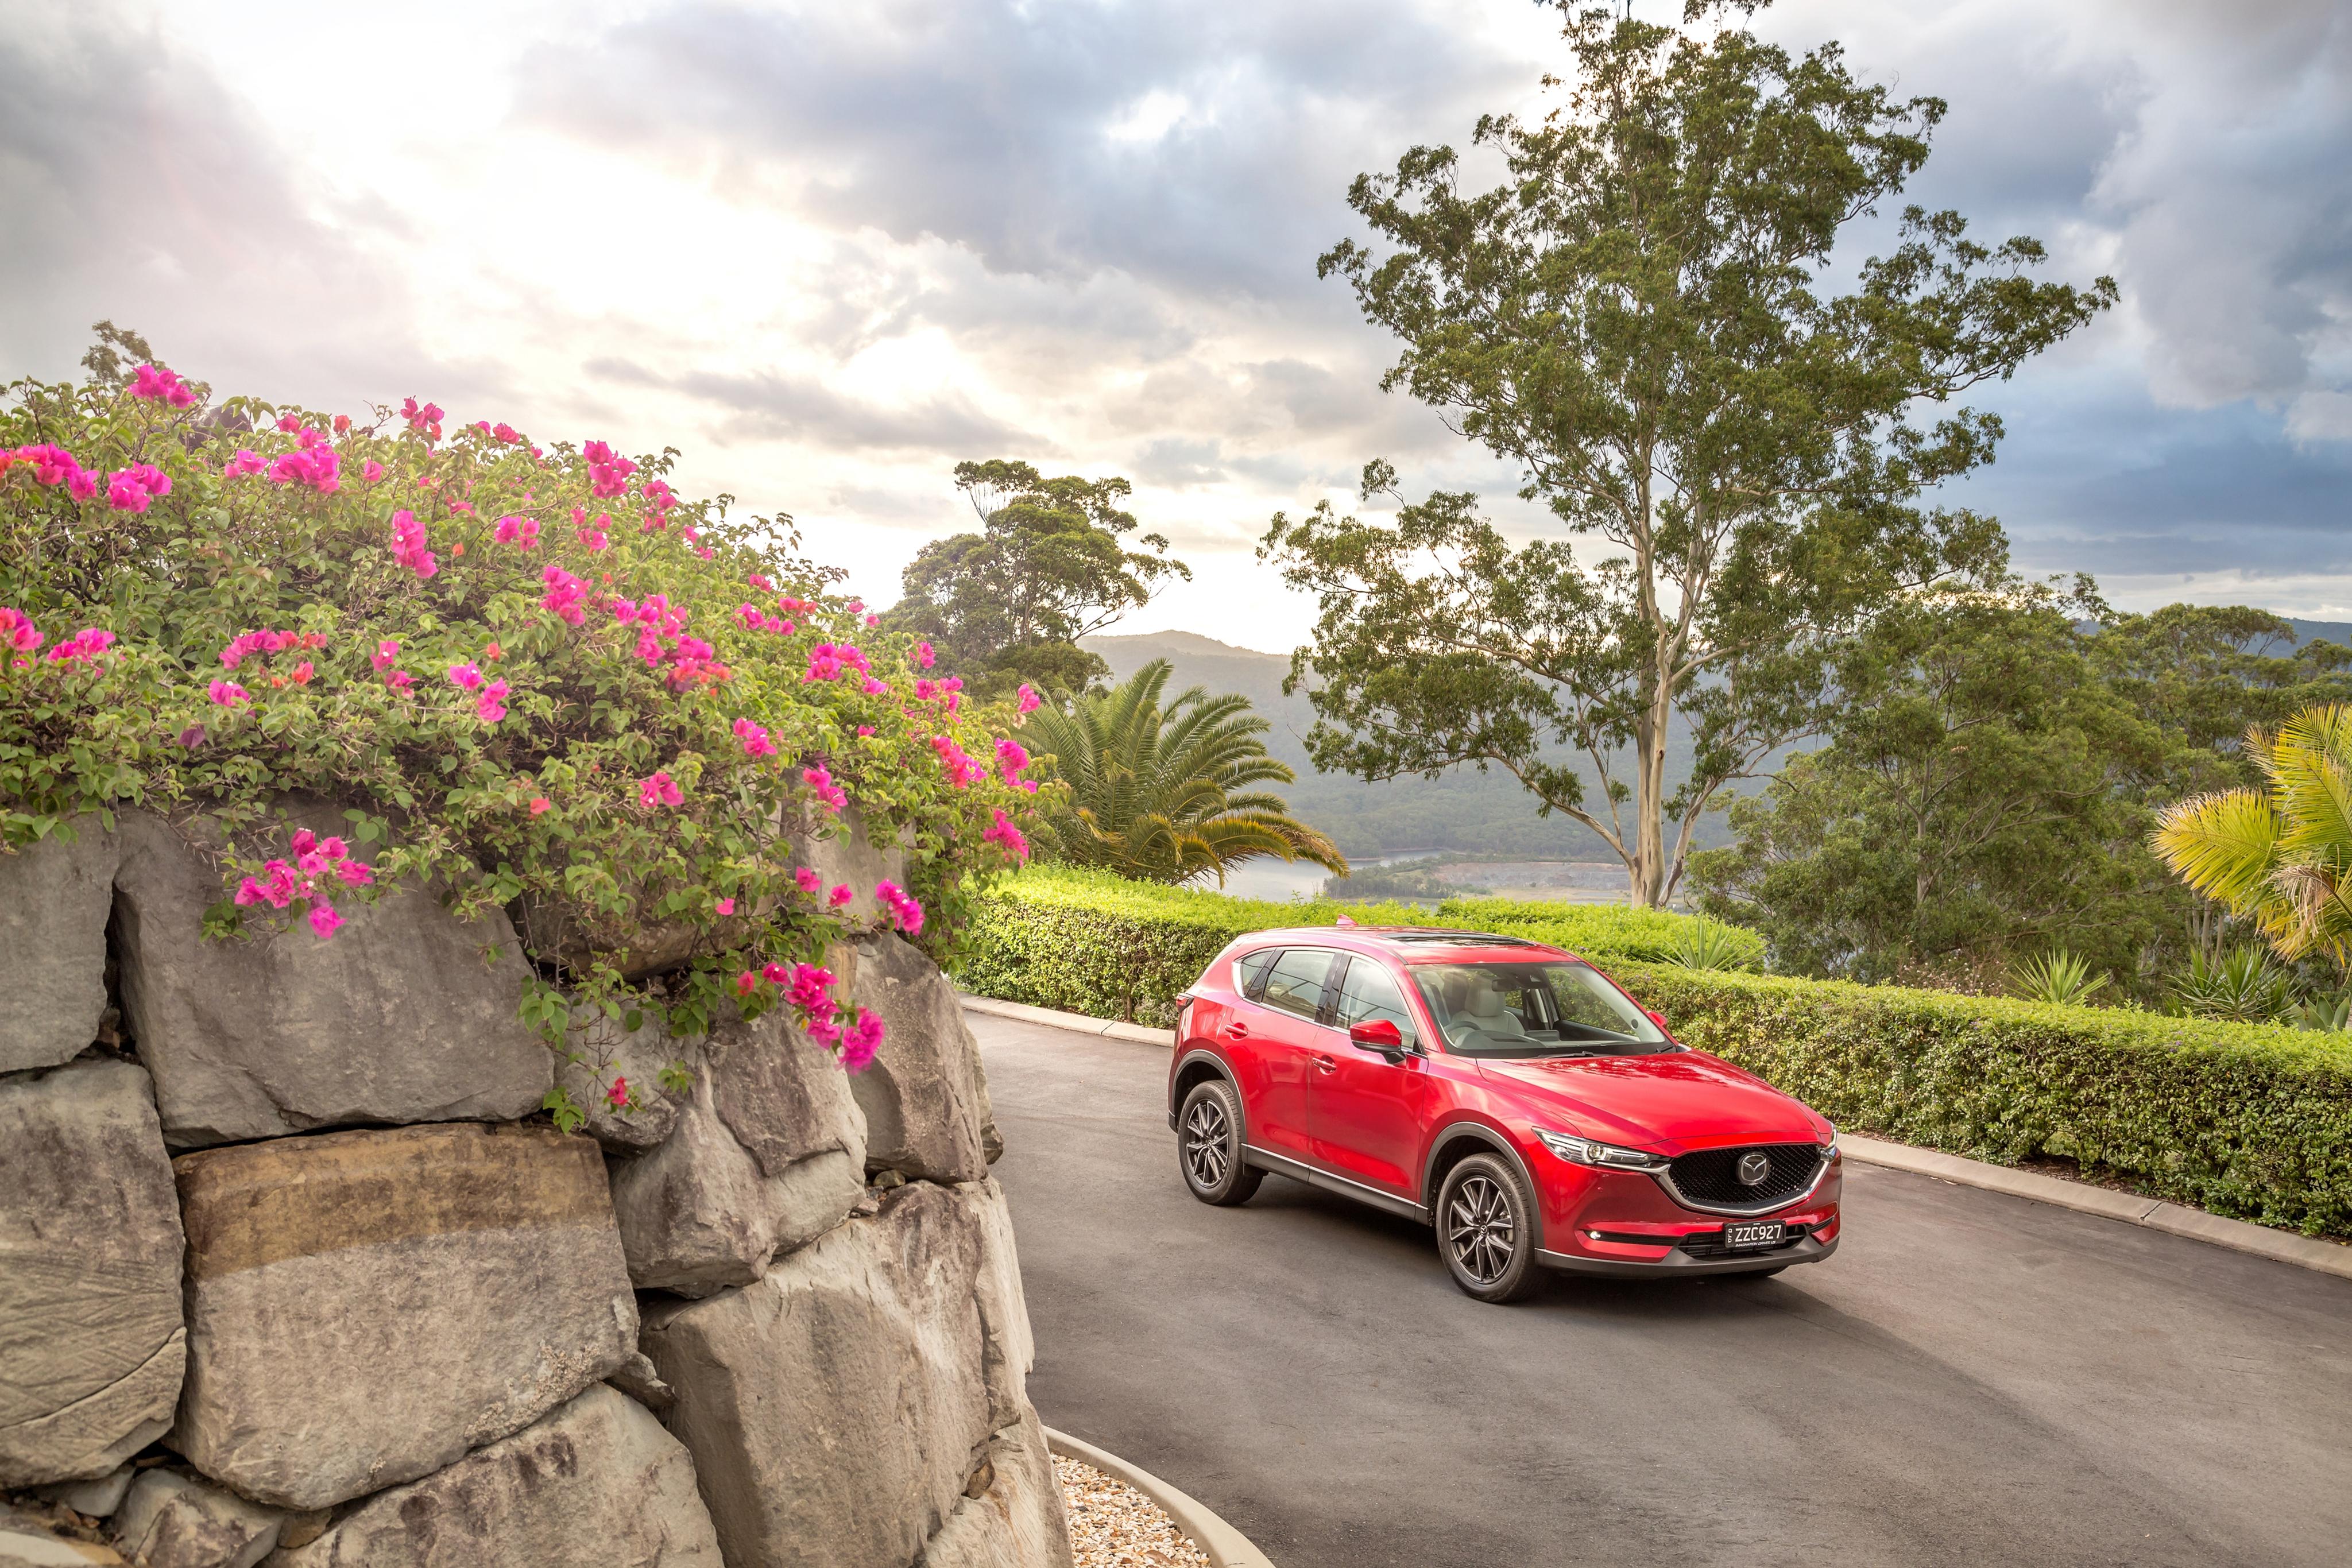 Картинка Mazda 2017 CX-5 Akera красных машина Металлик Мазда Красный красные красная авто машины автомобиль Автомобили